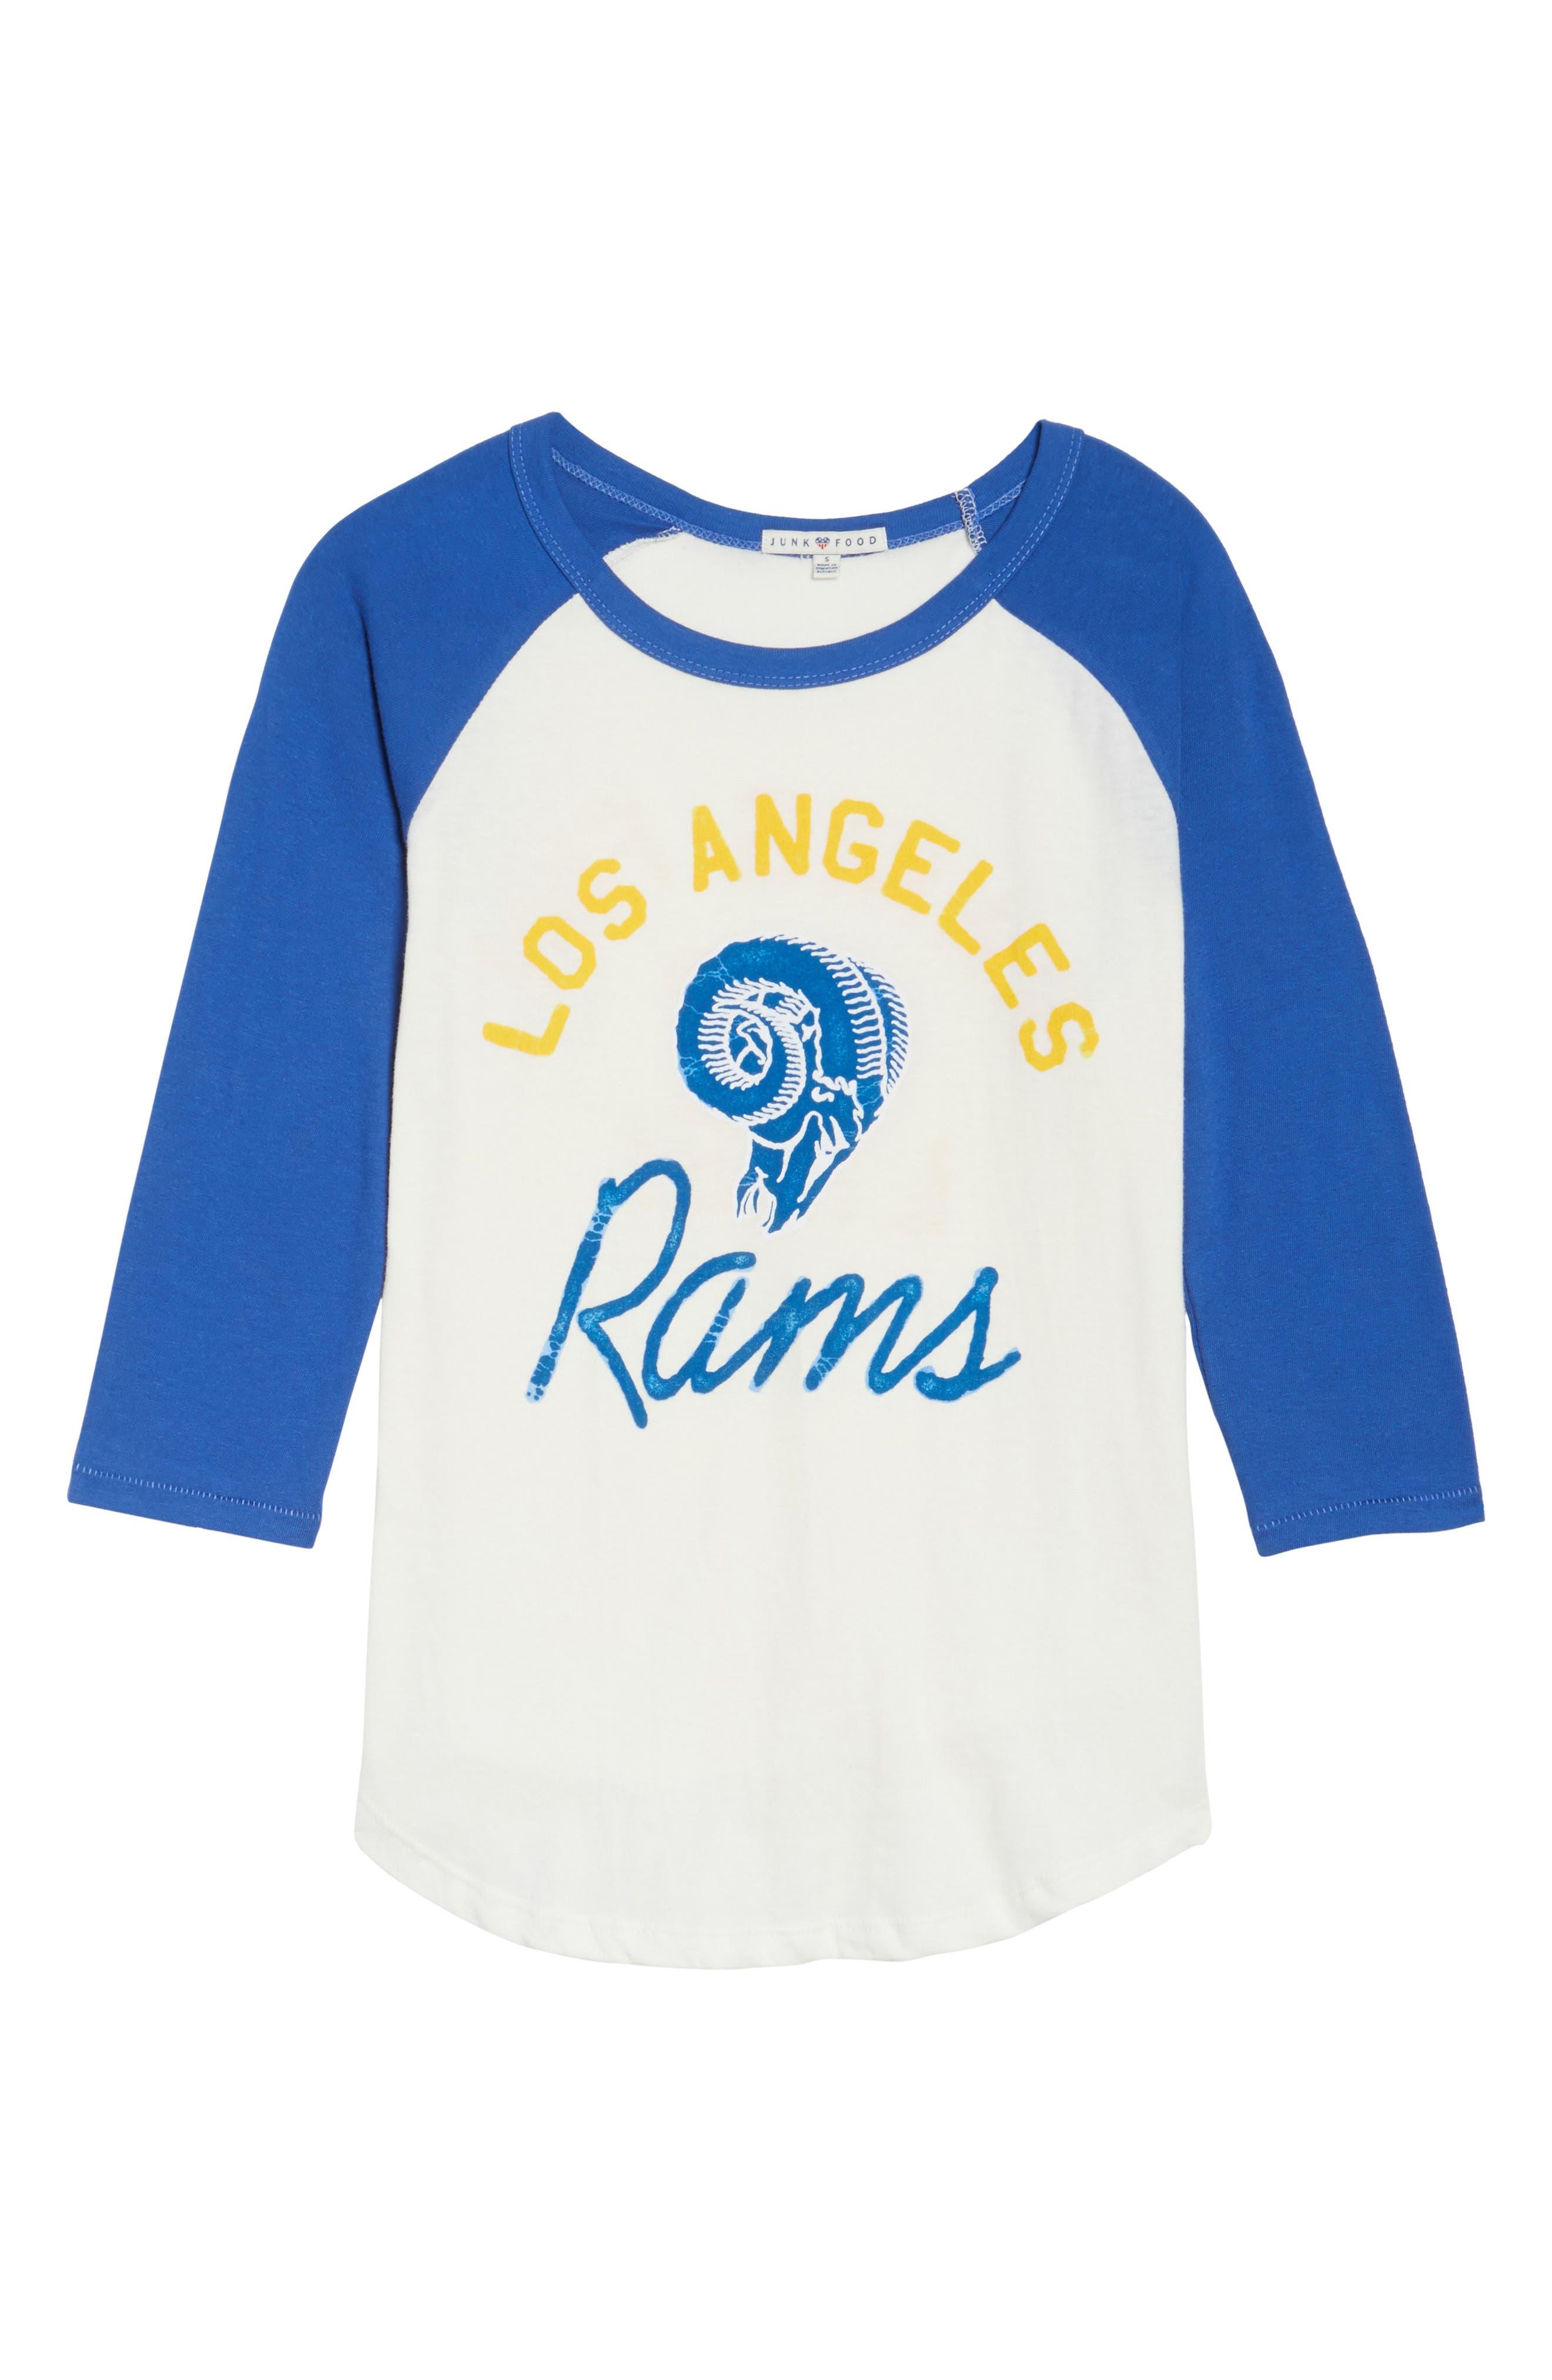 NFL Los Angeles Rams Raglan Tee,                             Alternate thumbnail 6, color,                             189